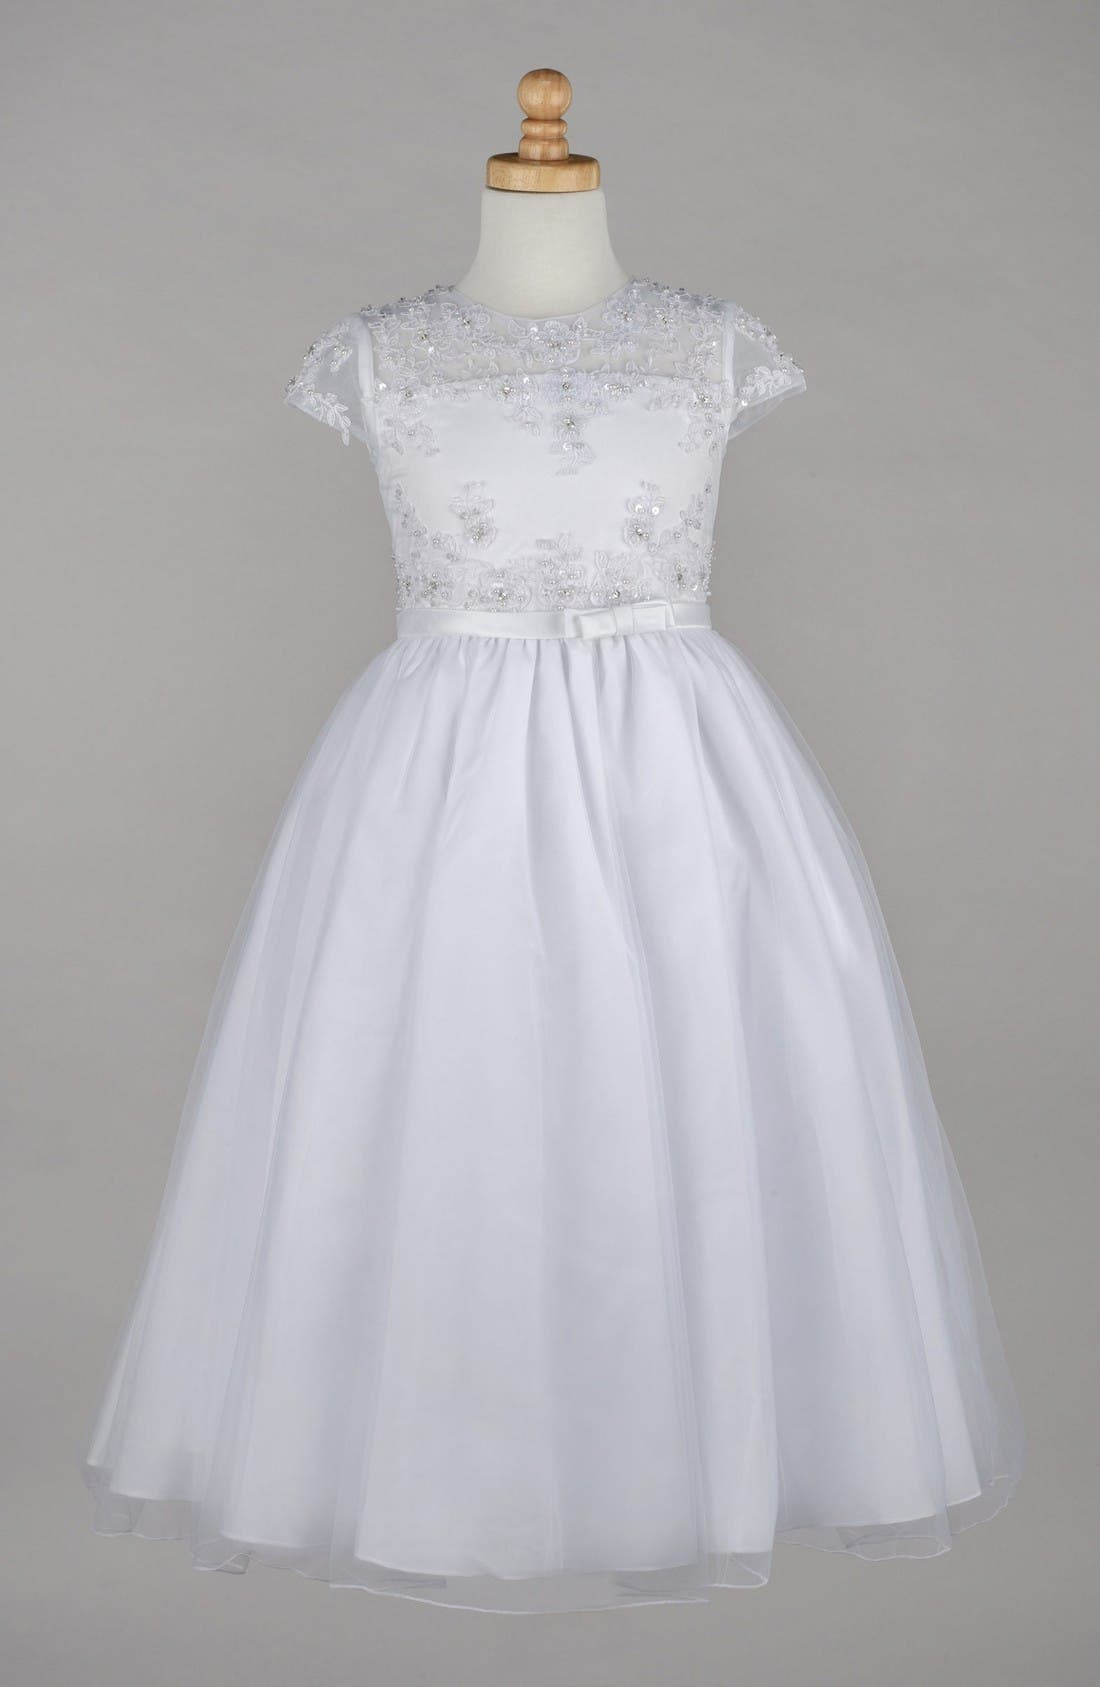 Main Image - Lauren Marie Beaded Lace Bodice First Communion Dress (Little Girls & Big Girls)